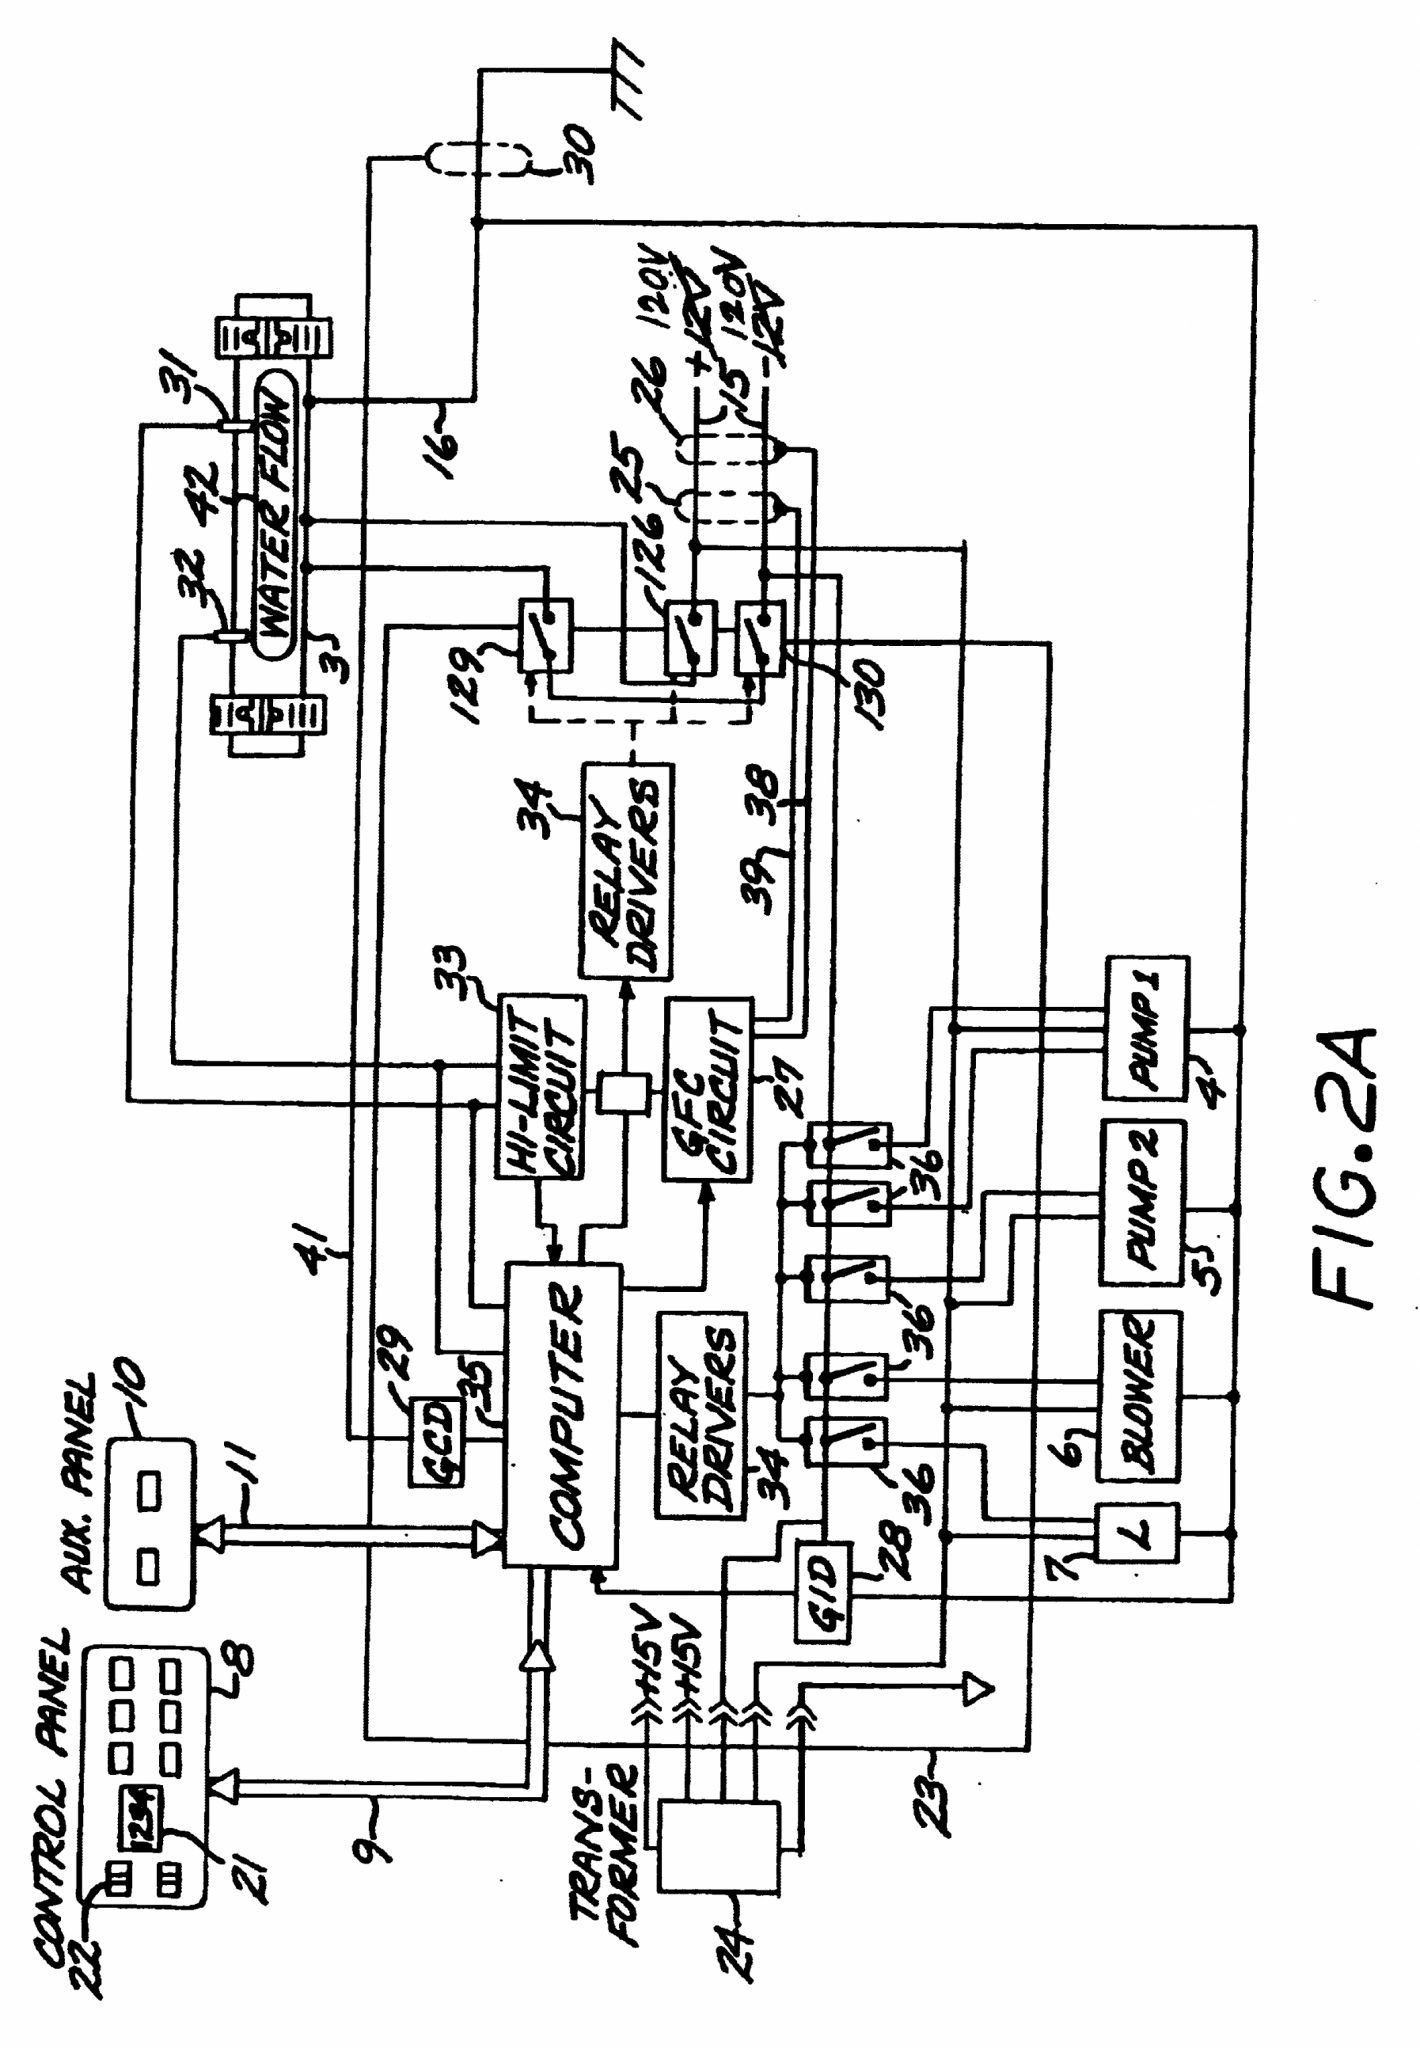 Rv Water Pump Switch Wiring Diagram